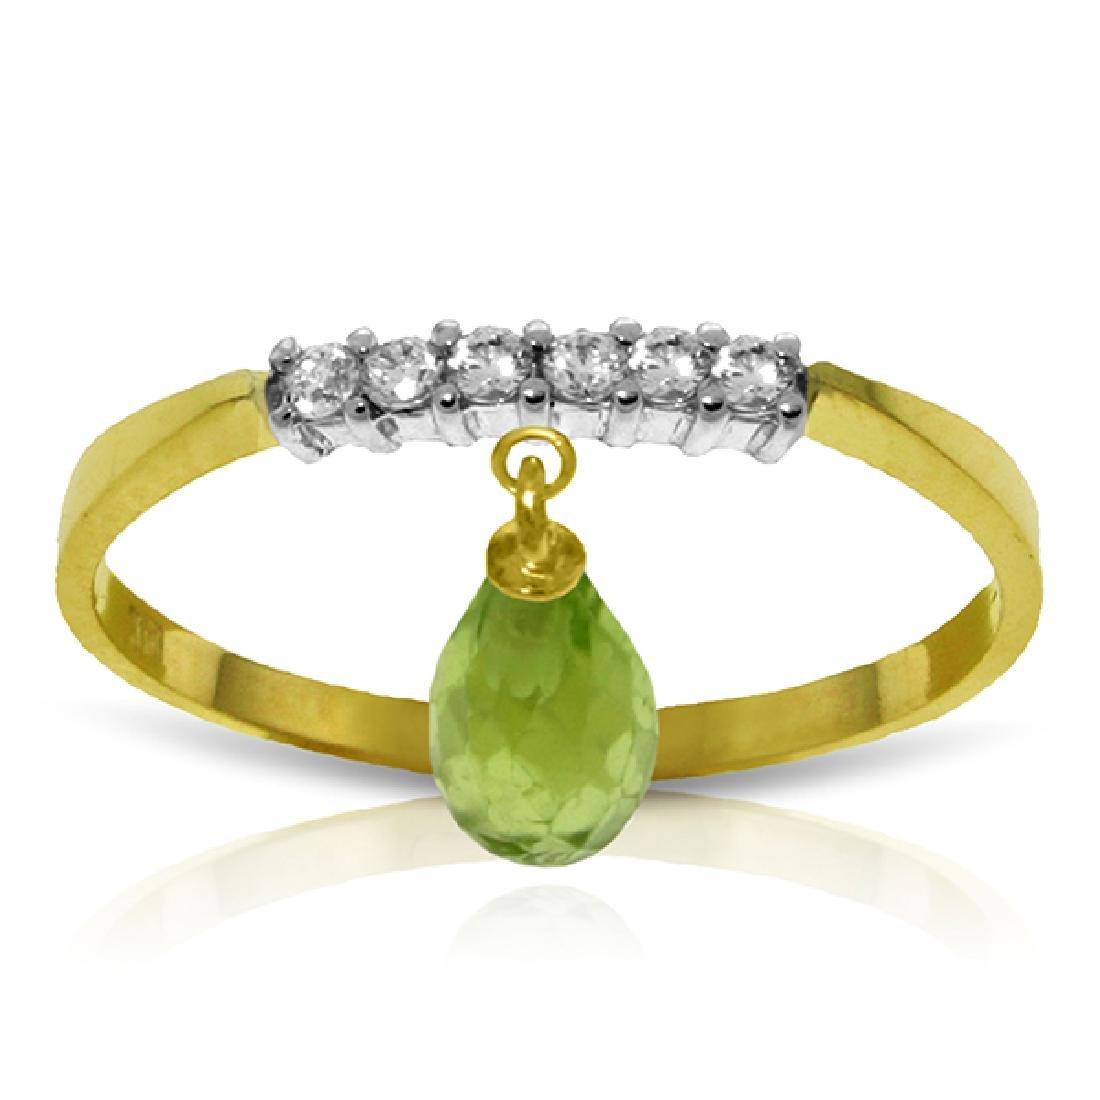 Genuine 1.45 ctw Peridot & Diamond Ring Jewelry 14KT